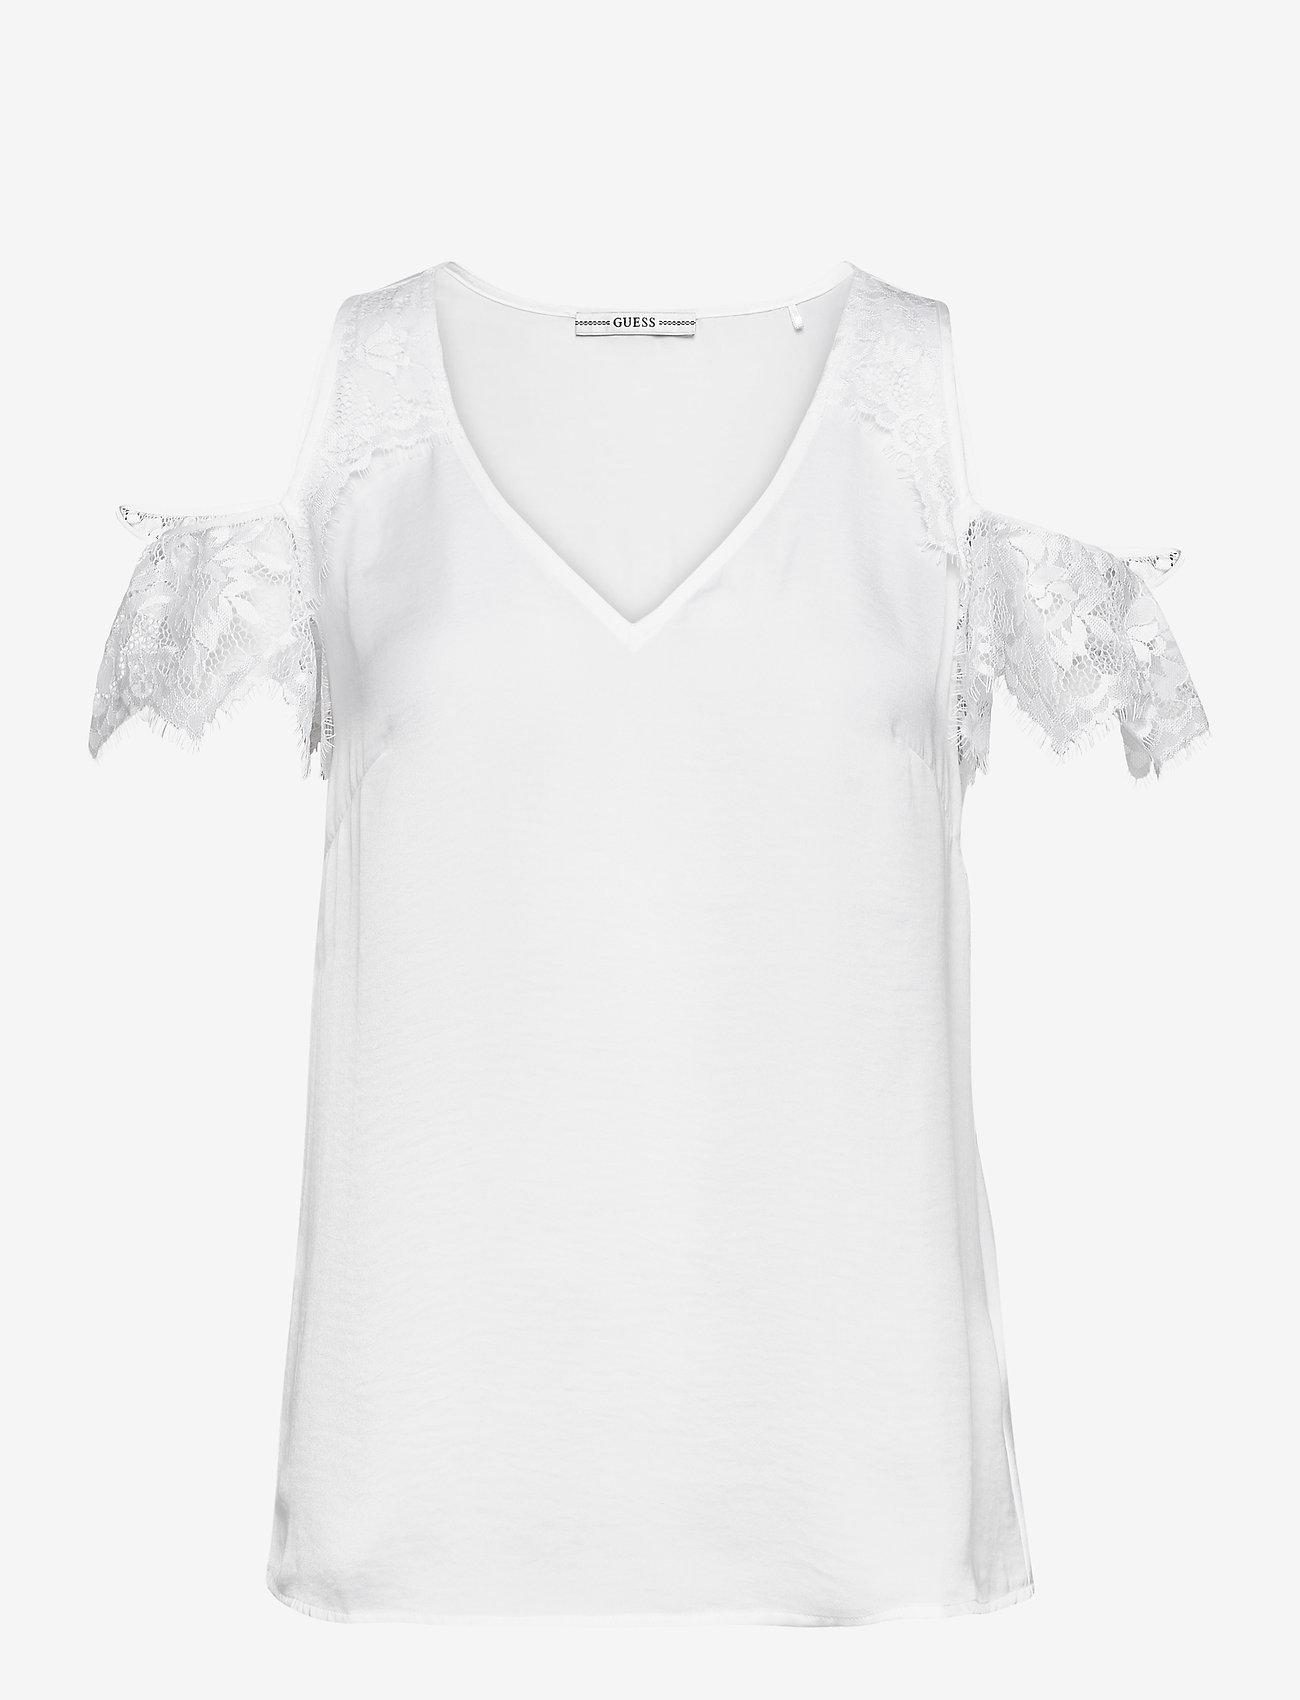 GUESS Jeans - SL MARIAH TOP - t-shirts - true white a000 - 0